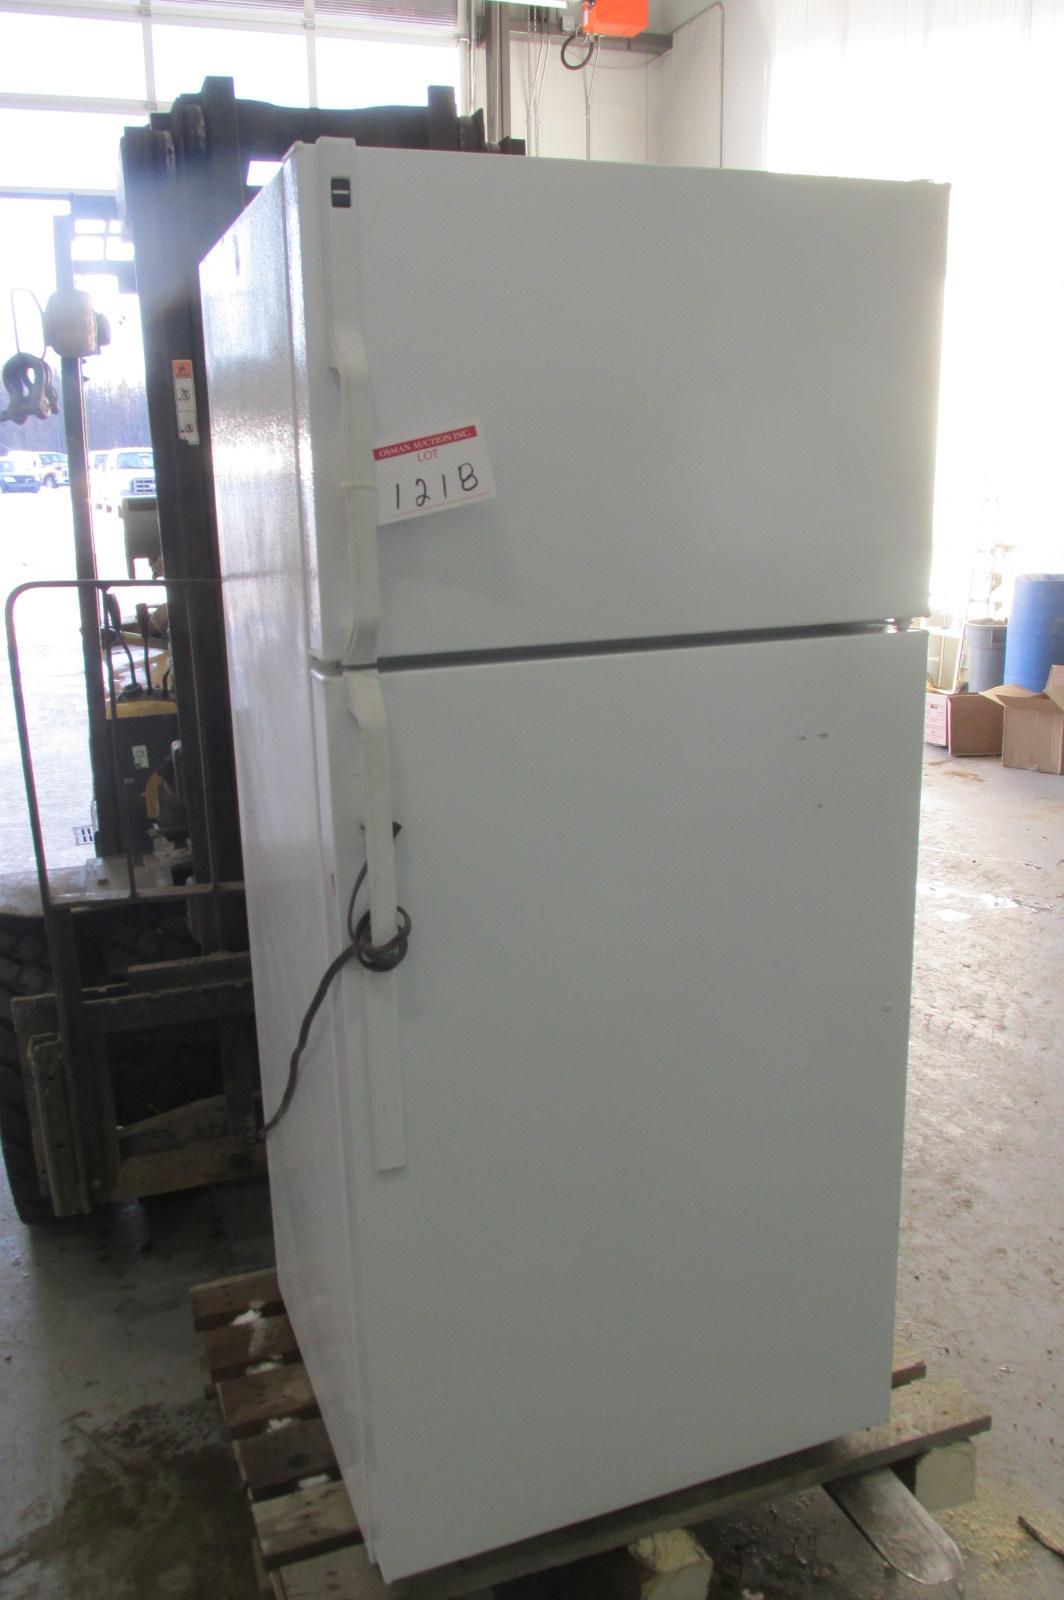 64 high x 28 wide x 26 deep moffat refrigerator. Black Bedroom Furniture Sets. Home Design Ideas